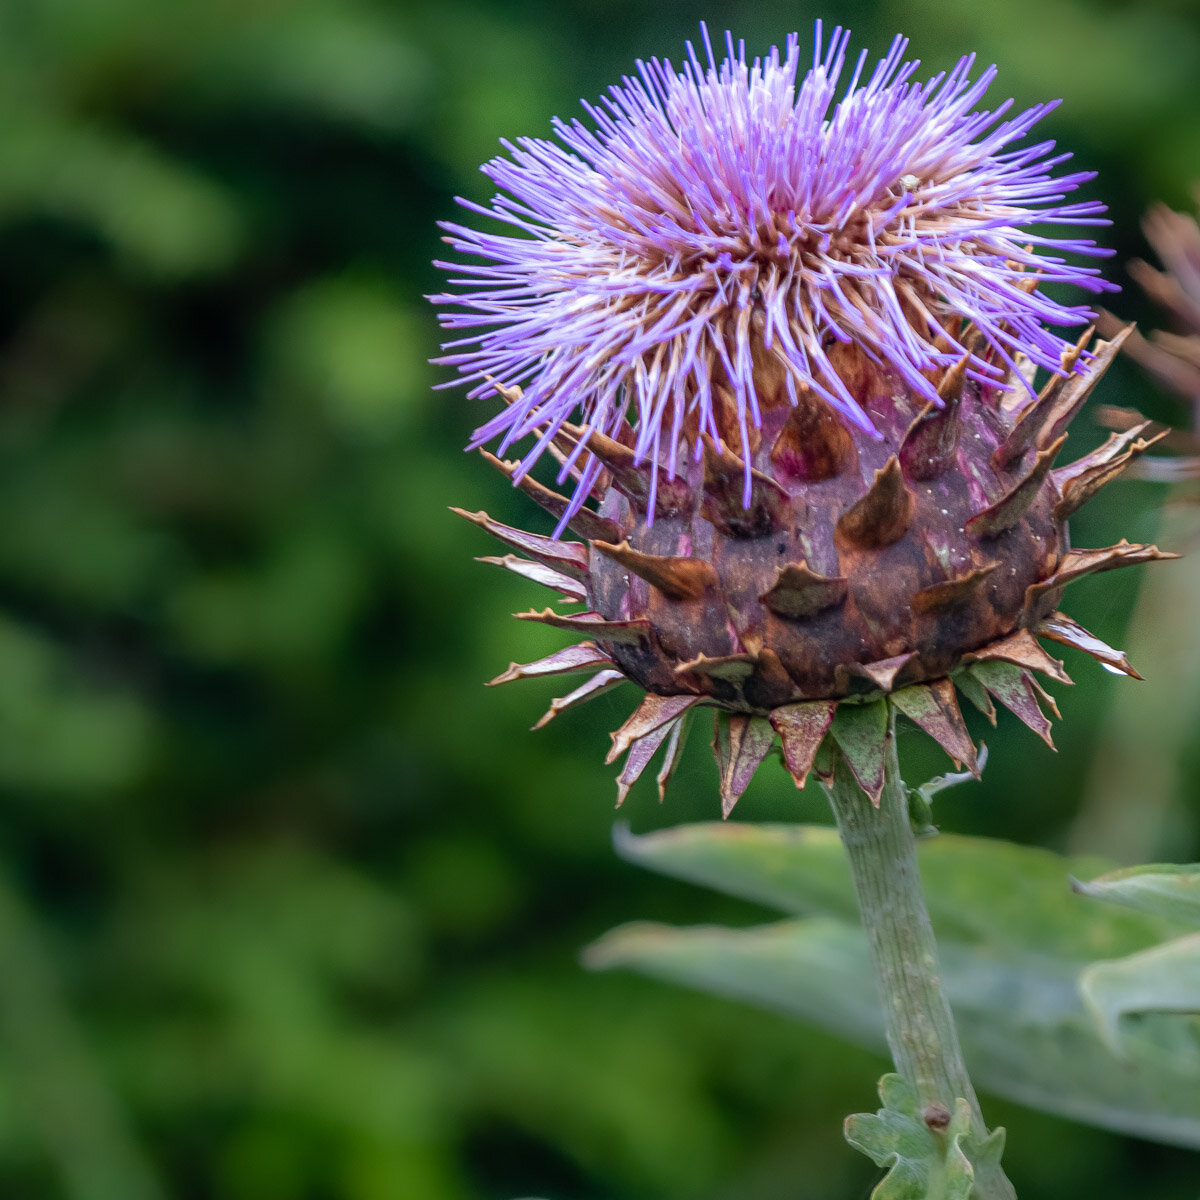 Thistle: National Symbol of Scotland